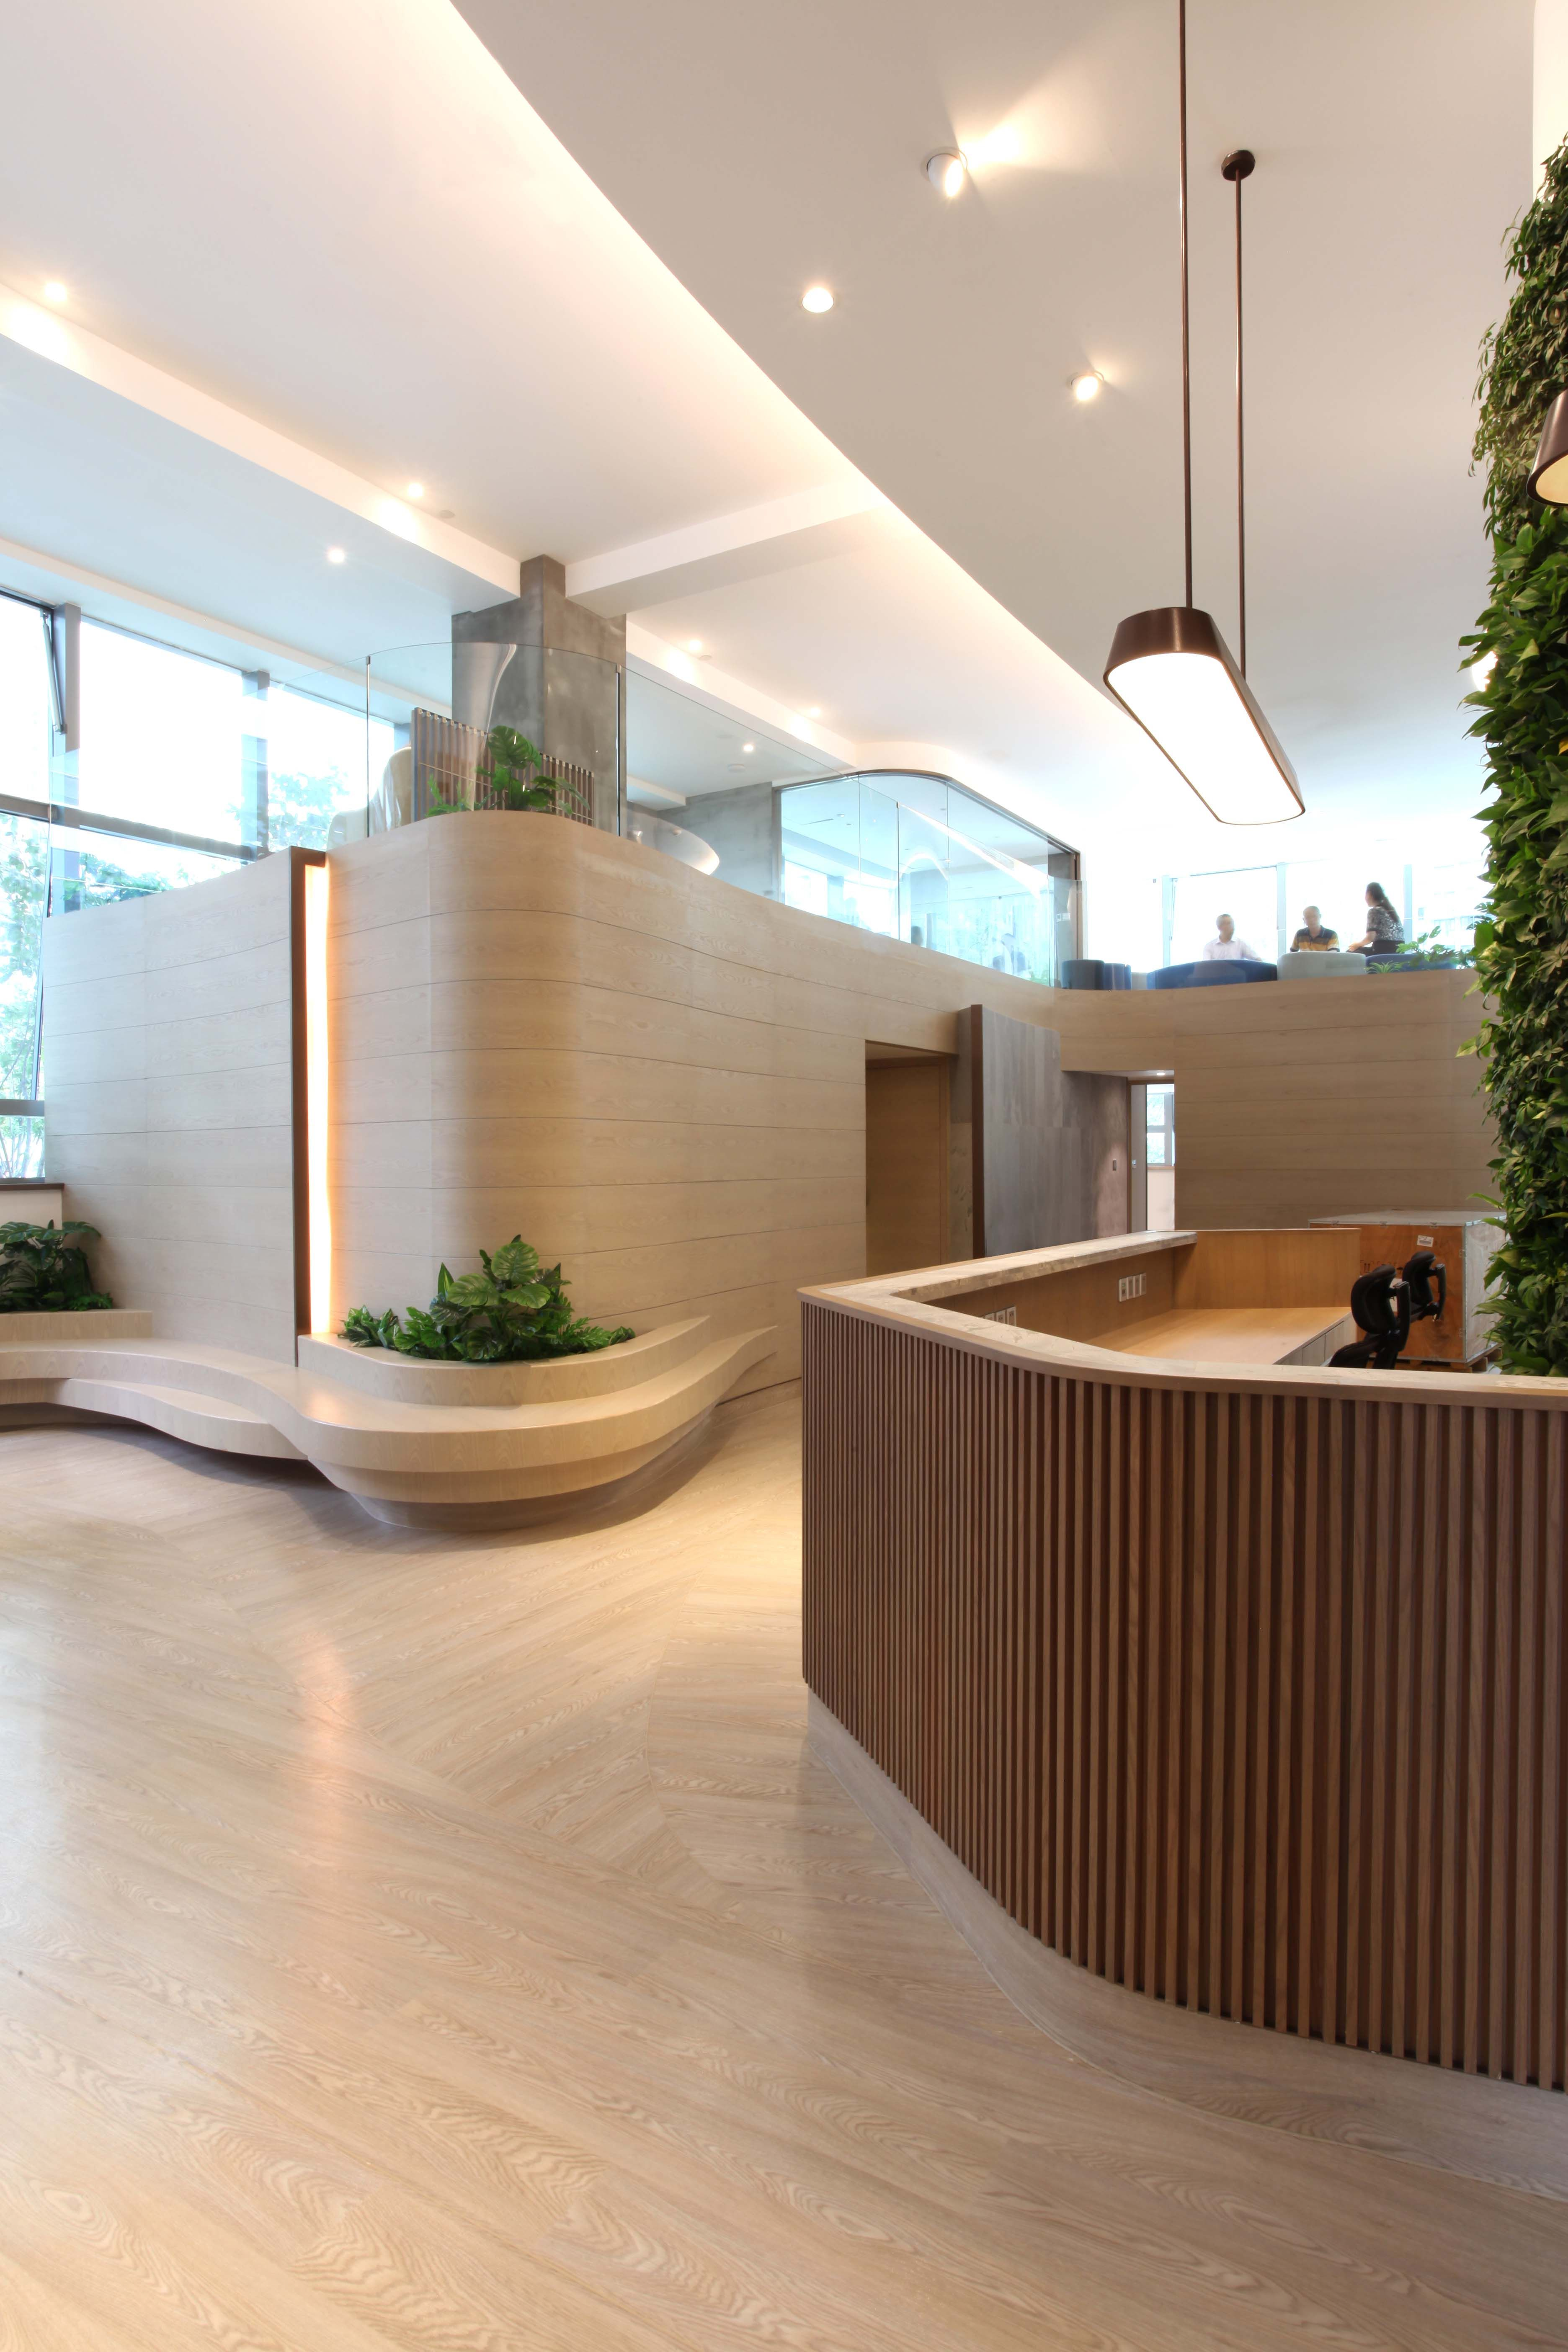 Studio Adjective Interior Design Comfort Interior Design Gynecology Pediatric Greene Waiting Room Design Hospital Interior Design Lobby Interior Design